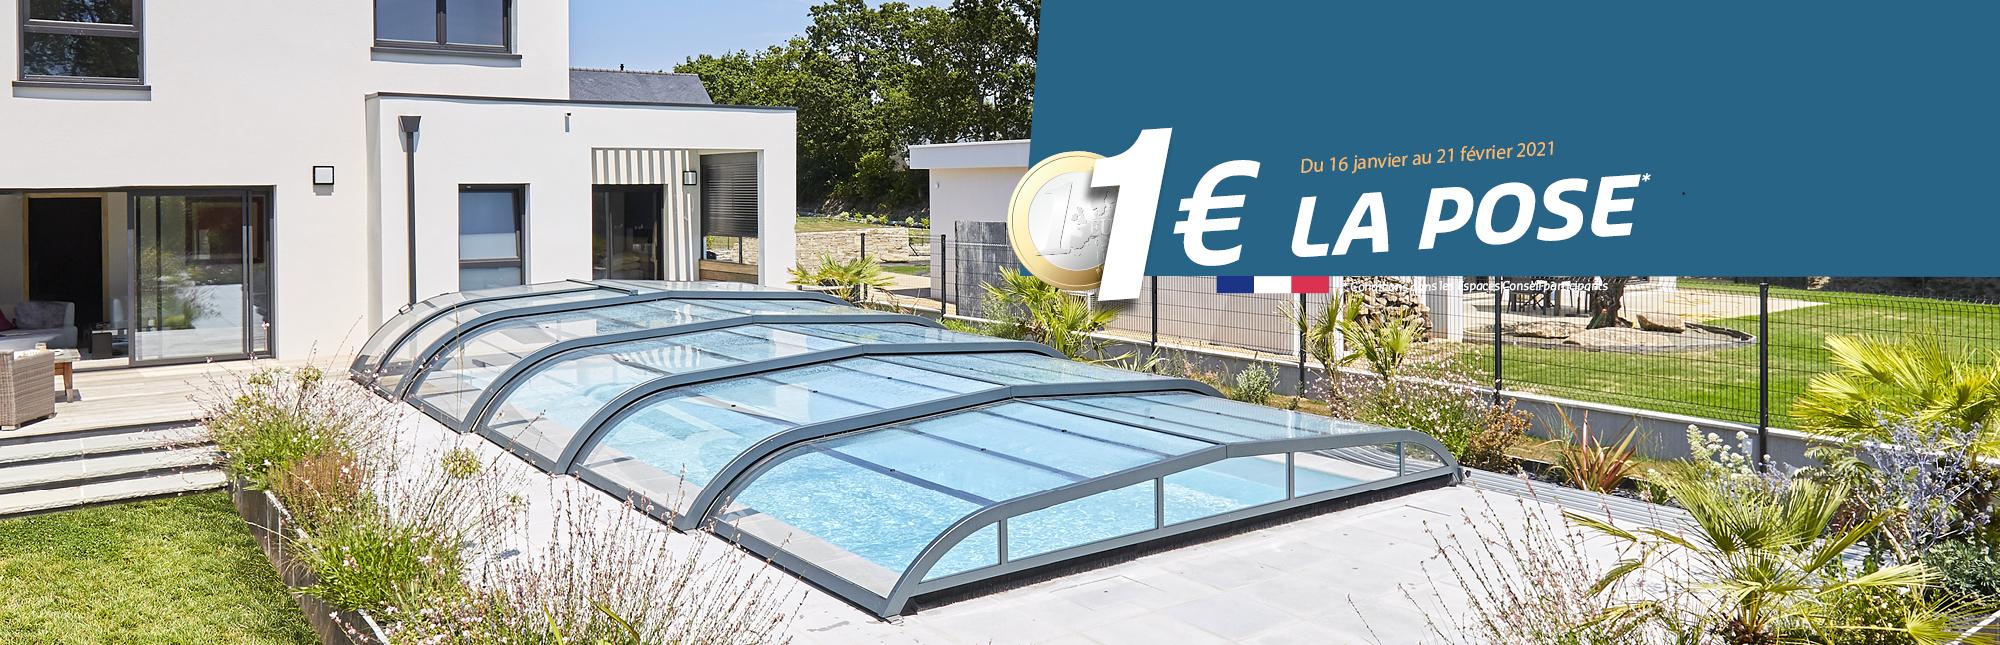 Abri De Piscine En Aluminium: Fabrication Sur Mesure - Abri ... serapportantà Abri De Piscine Rideau